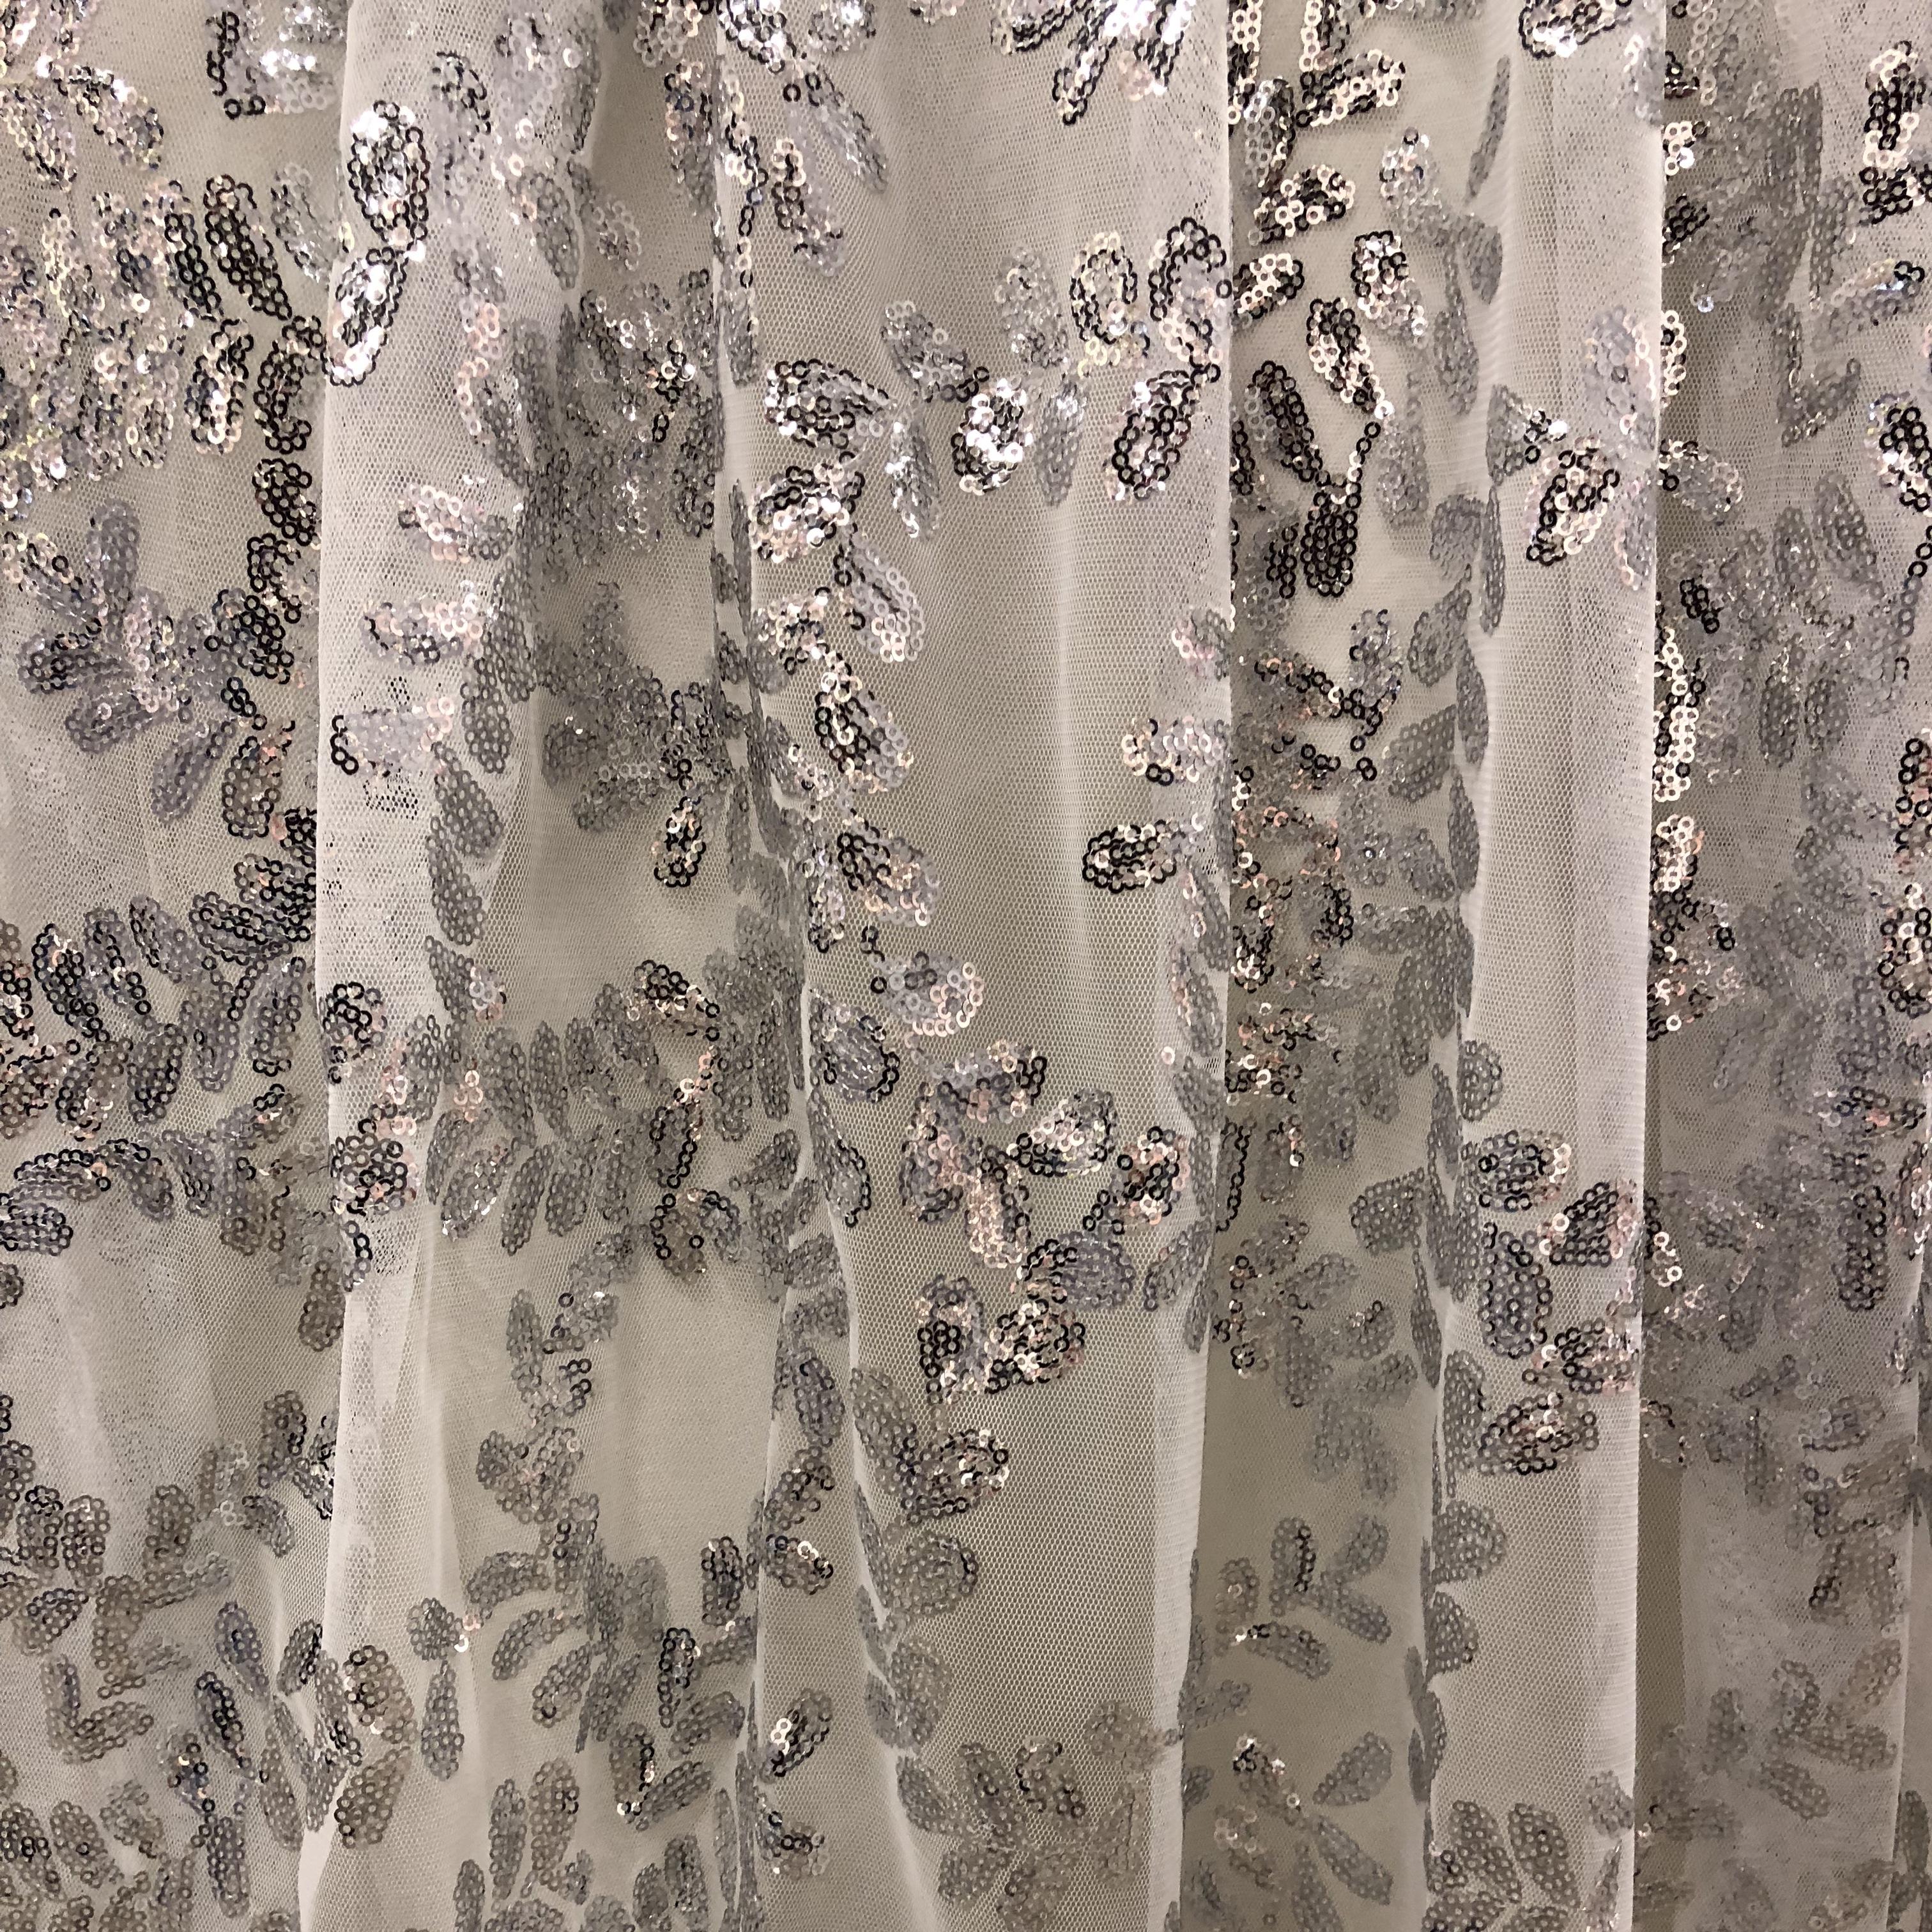 Charming Missoni Shower Curtain Images Bathtub For